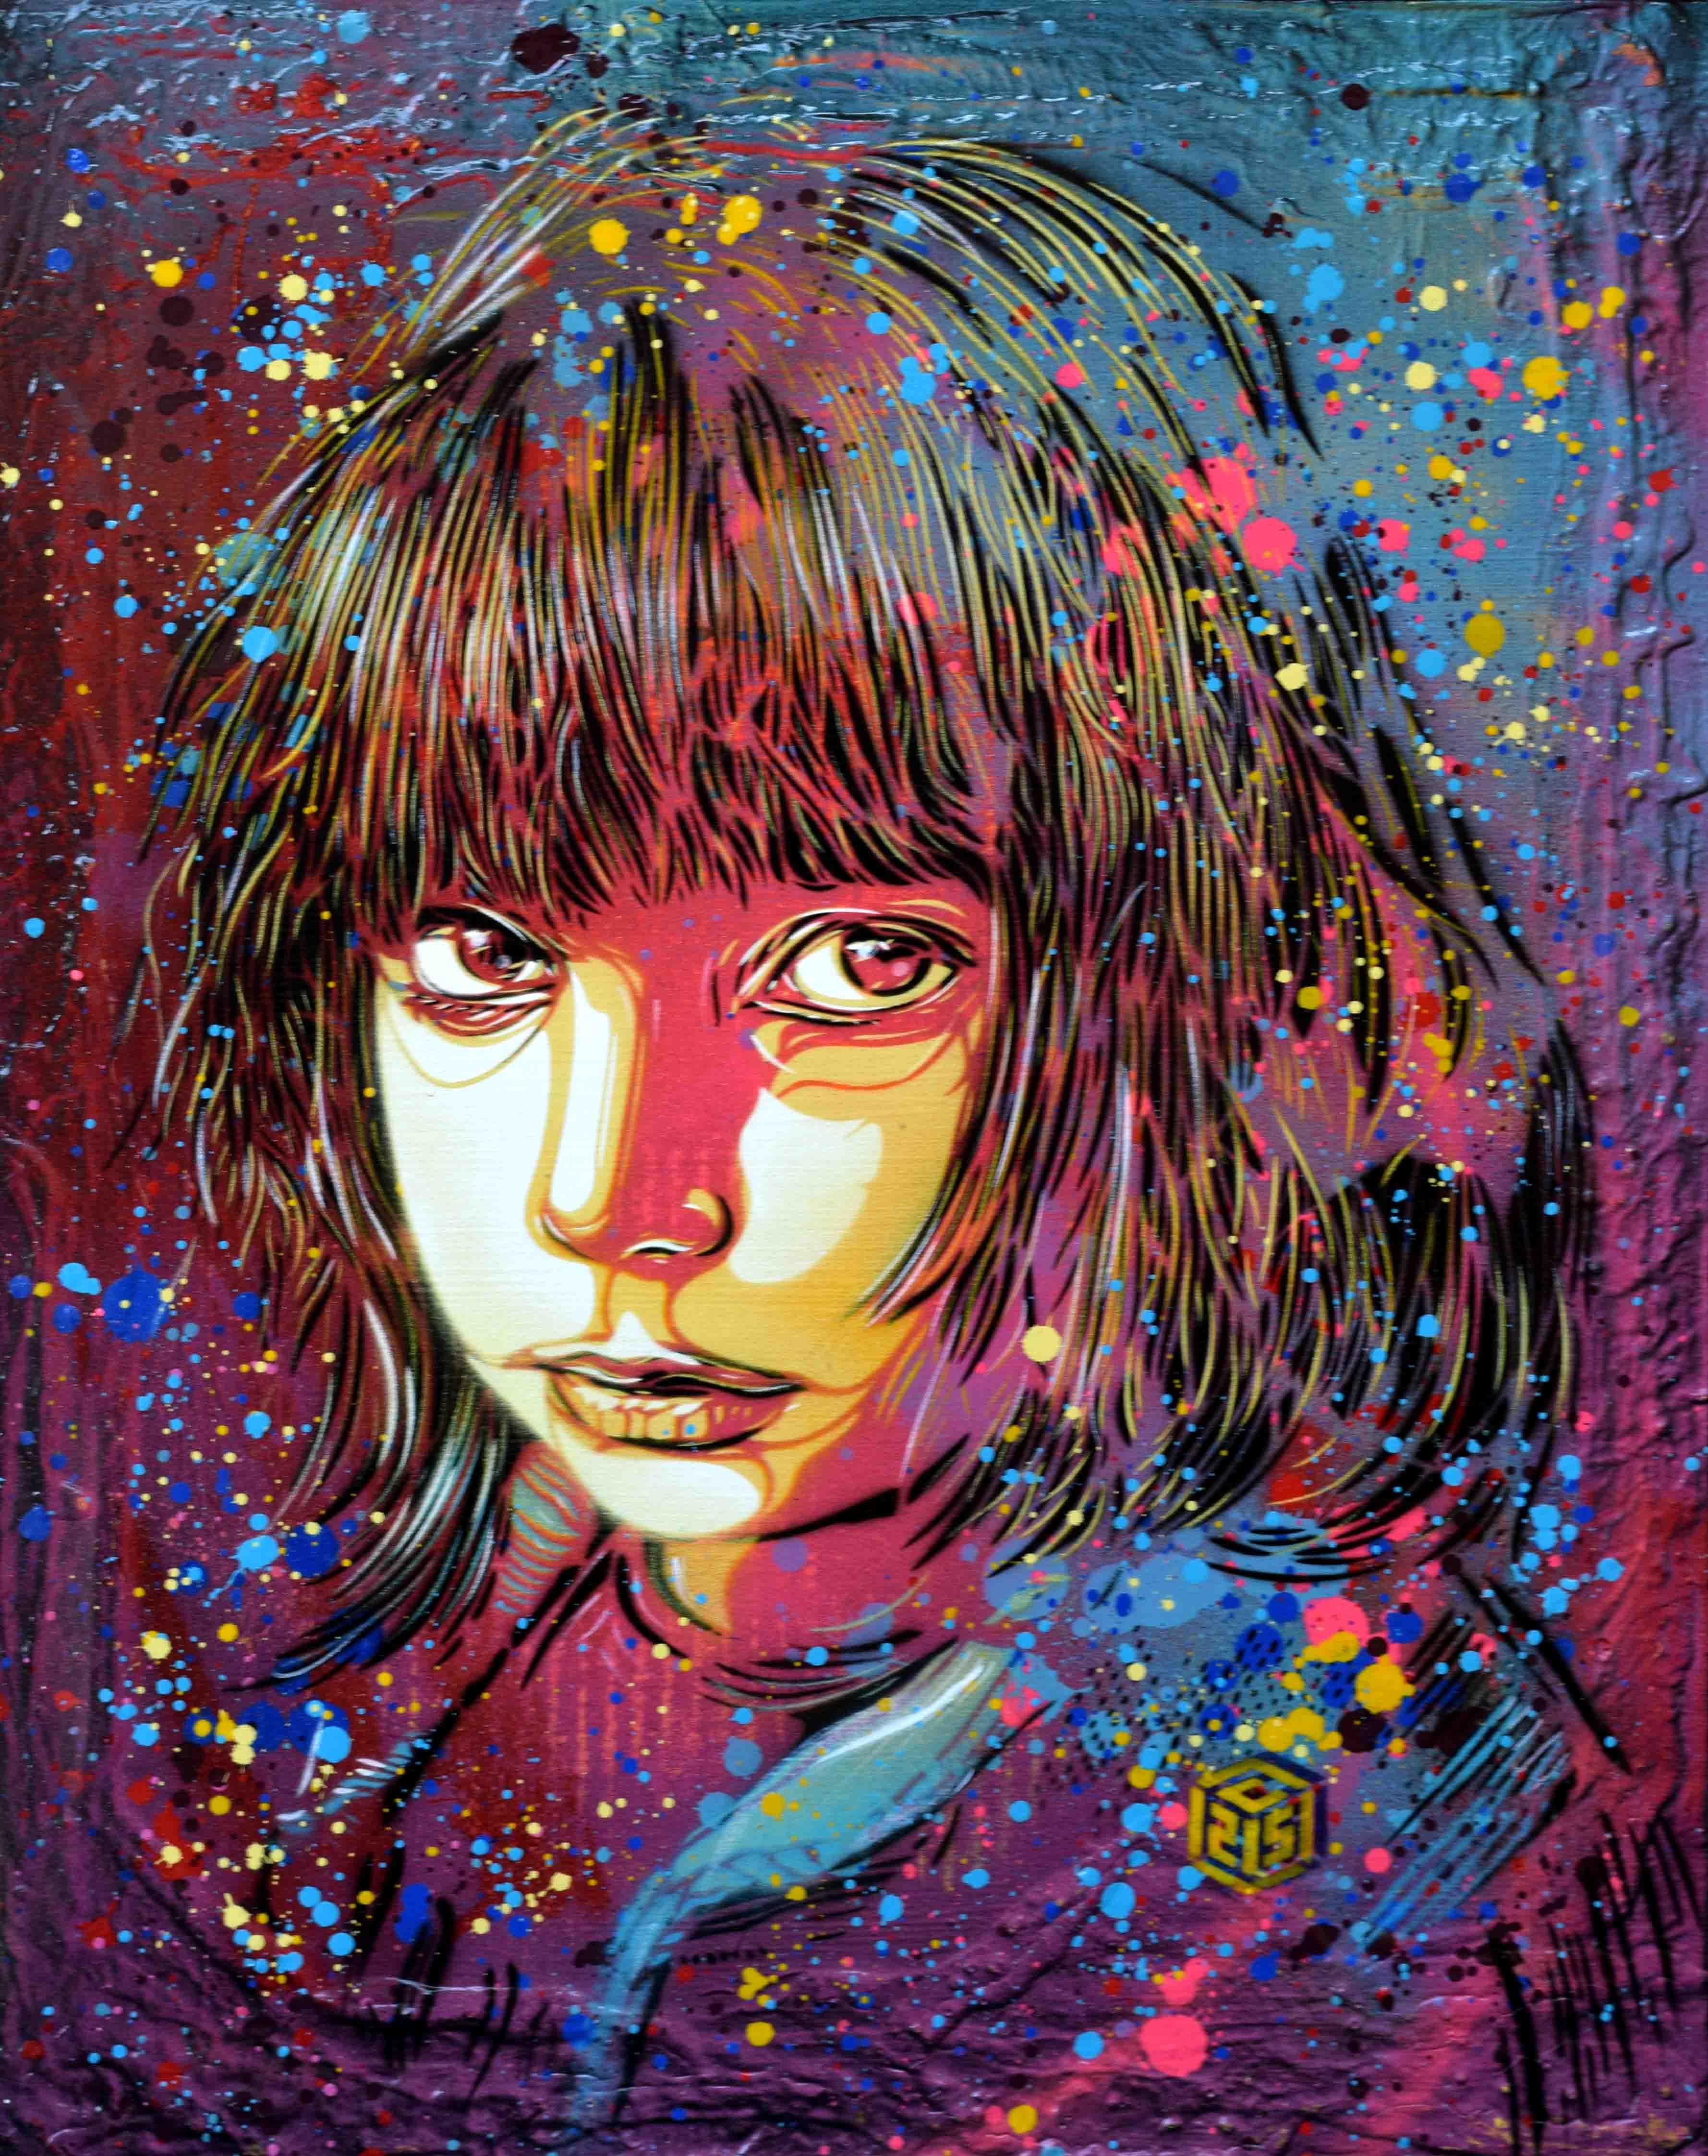 https://www.galerie-saint-martin.com/artistes/c215/